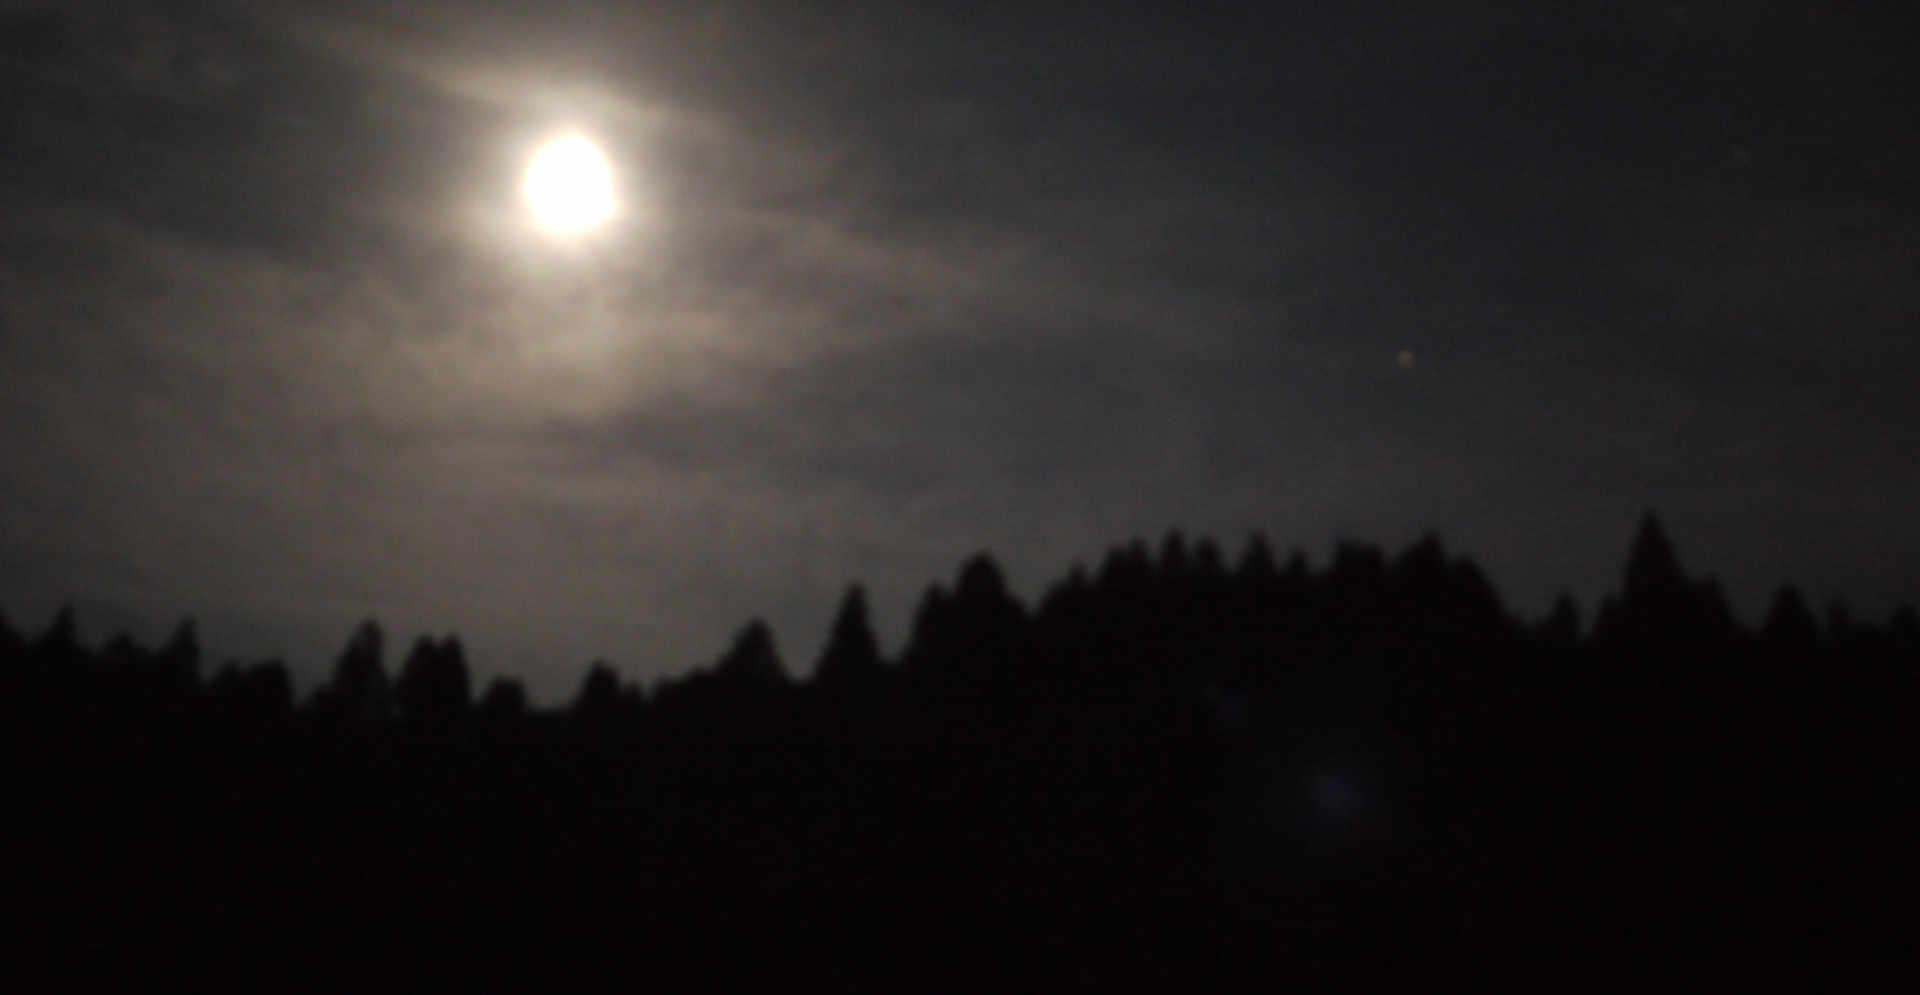 Moon wathcing in the silence